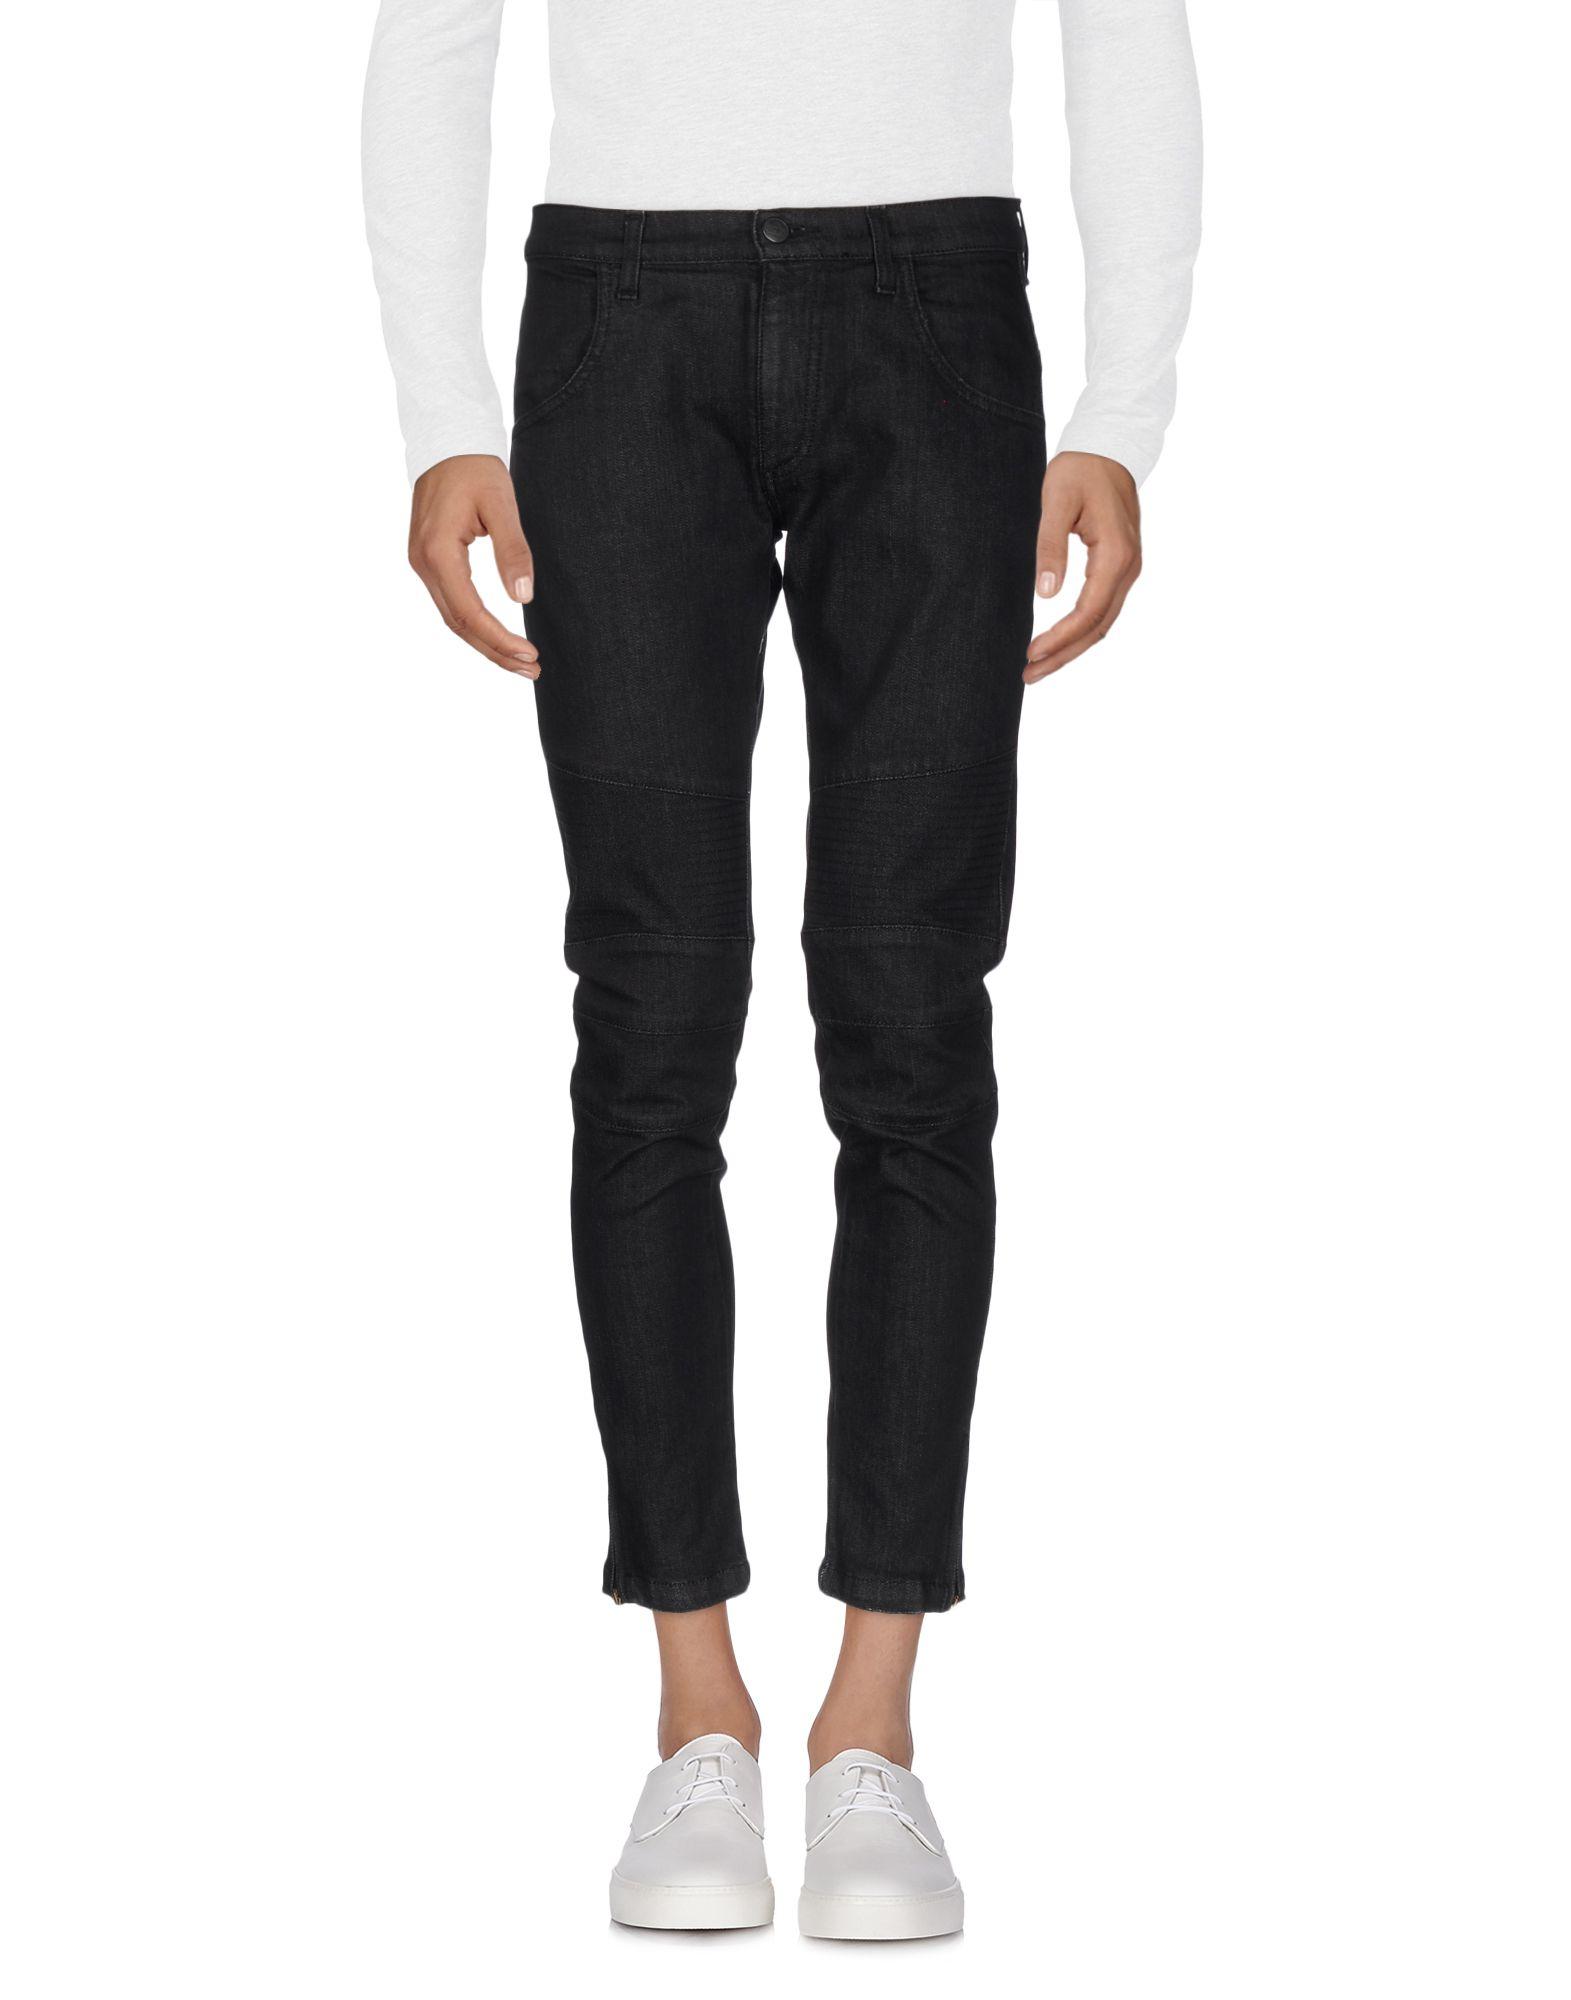 CHOICE NICOLA PELINGA Джинсовые брюки цены онлайн